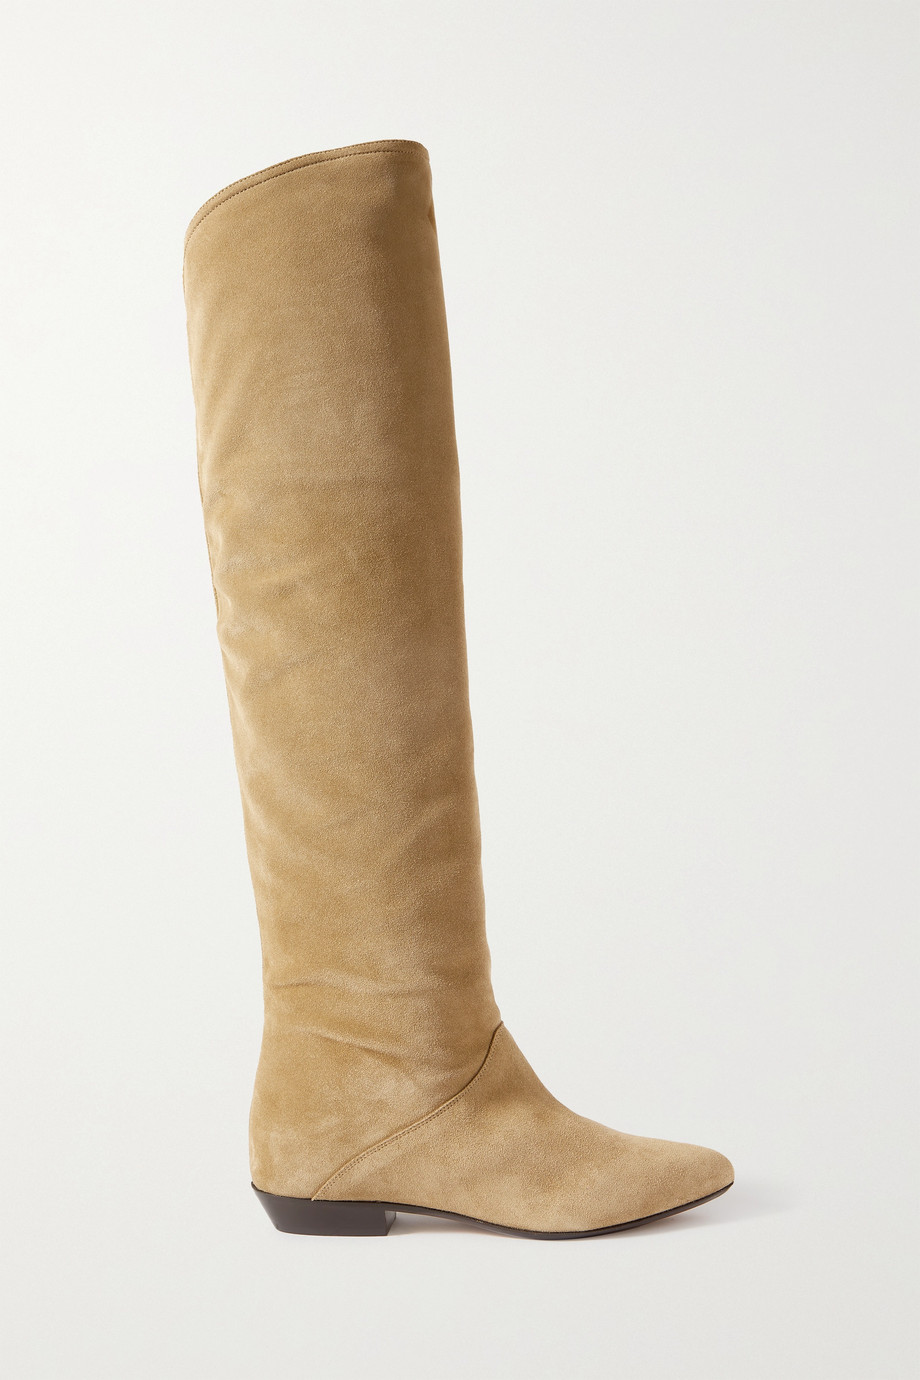 Isabel Marant Seelys suede knee boots